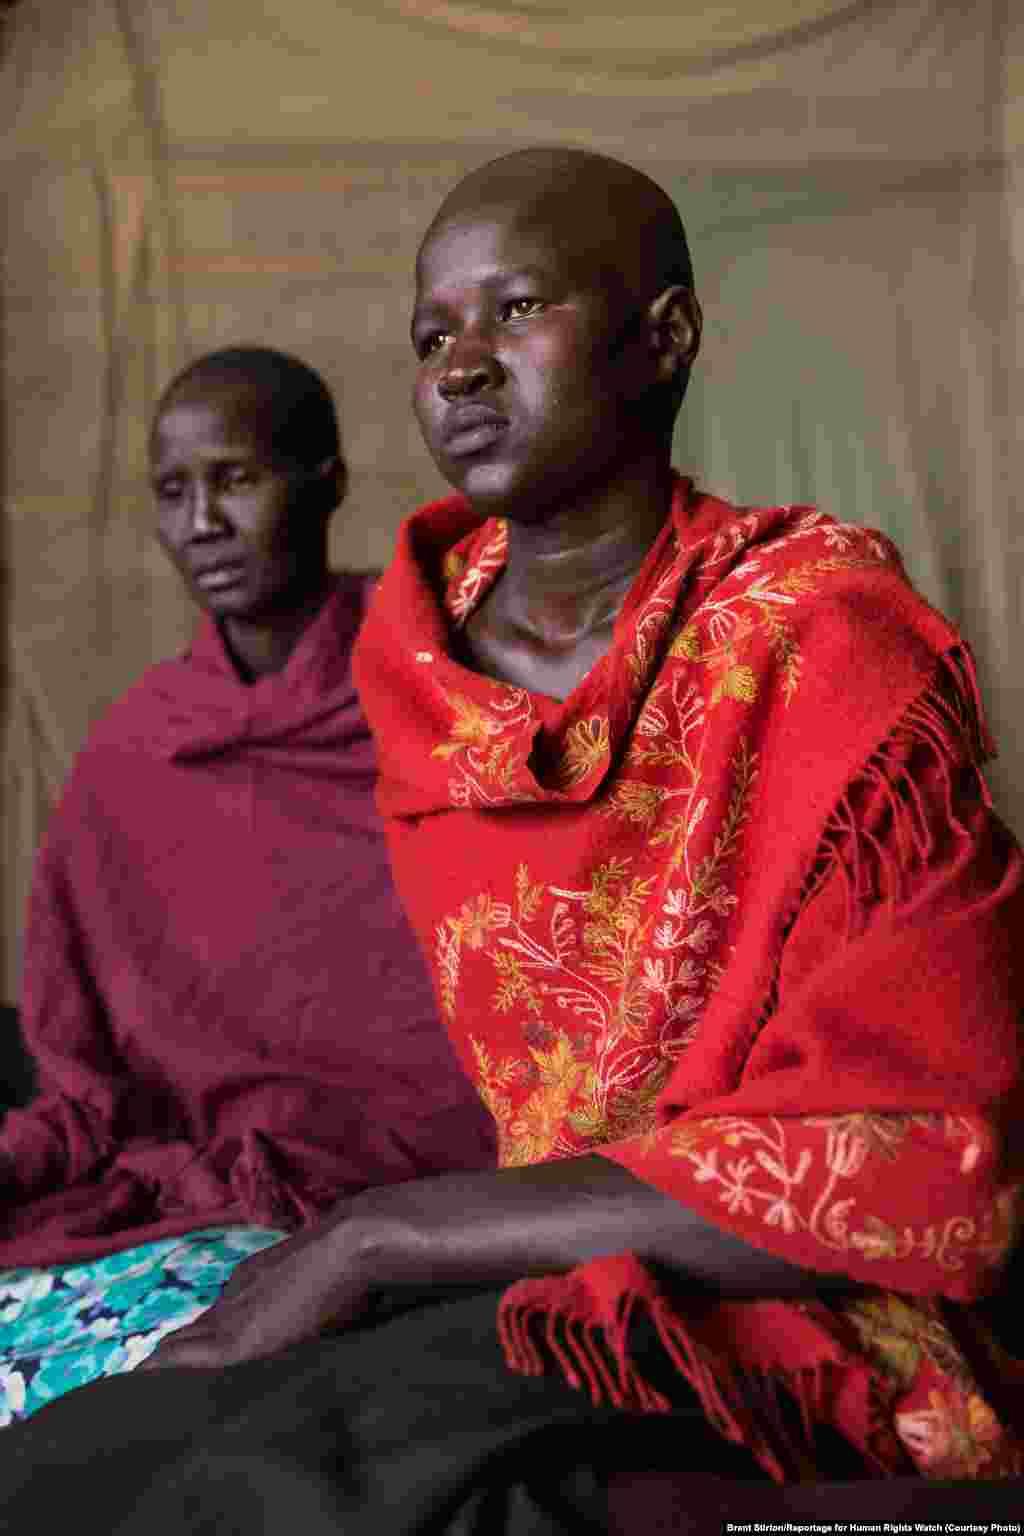 Akuot, 16, dari Bor, negara bagian Jonglei dipukul selama tiga hari setelah menolak dikawinkan dengan mahar ternak. Ia merupakan salah satu anak-anak perempuan yang diwawancarai oleh Human Rights Watch untuk laporan mengenai pernikahan di bawah umur di Sudan Selatan. (Brent Stirton/Human Rights Watch)